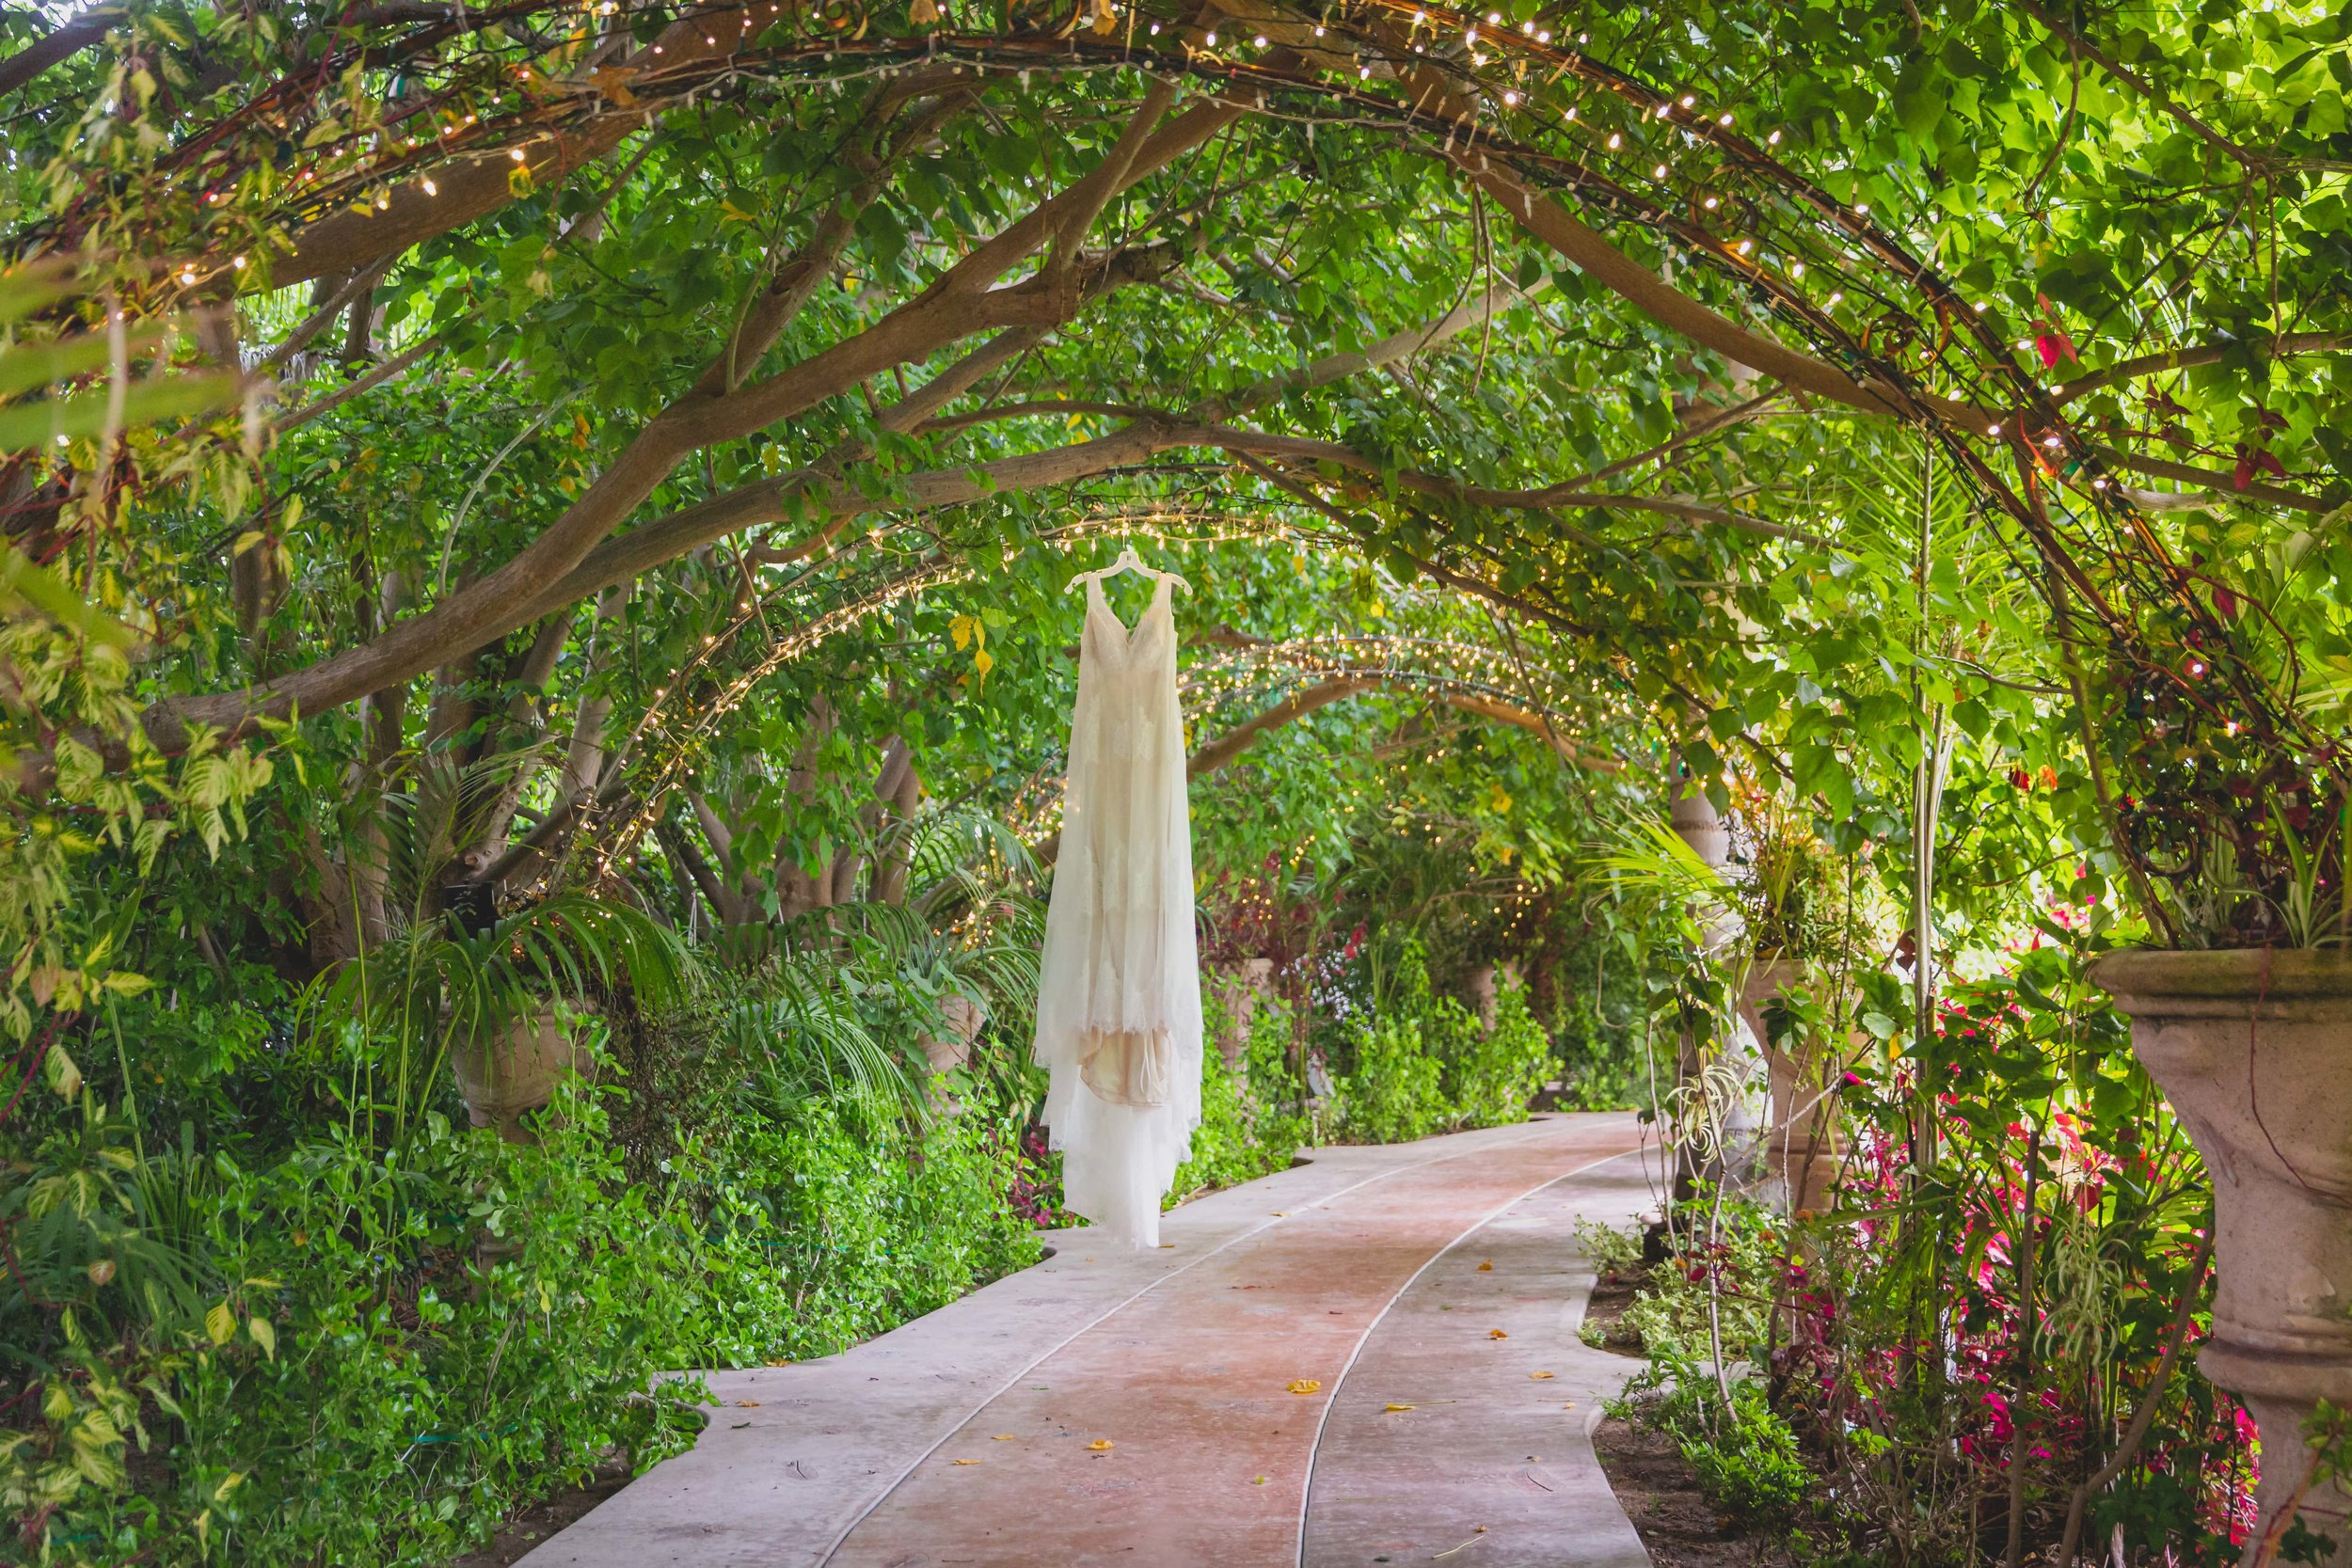 Wedding Photography - Something Old, Something New, Something Borrowed, Something Blue - Wedding dress hanging in a lush green garden walkway